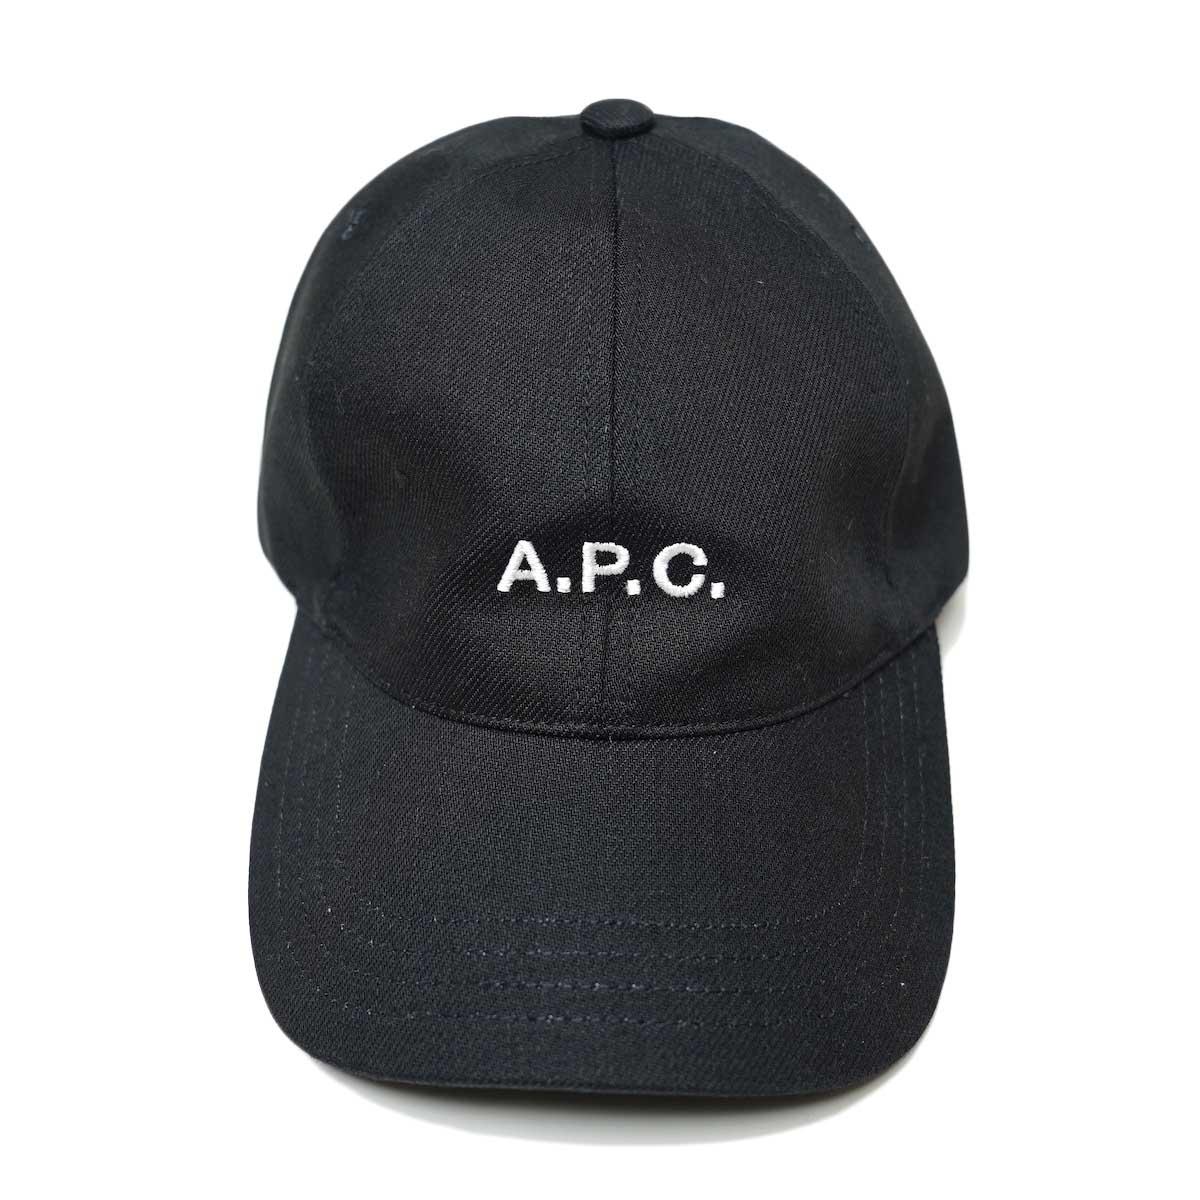 A.P.C / Charlie キャスケット (Black) 正面